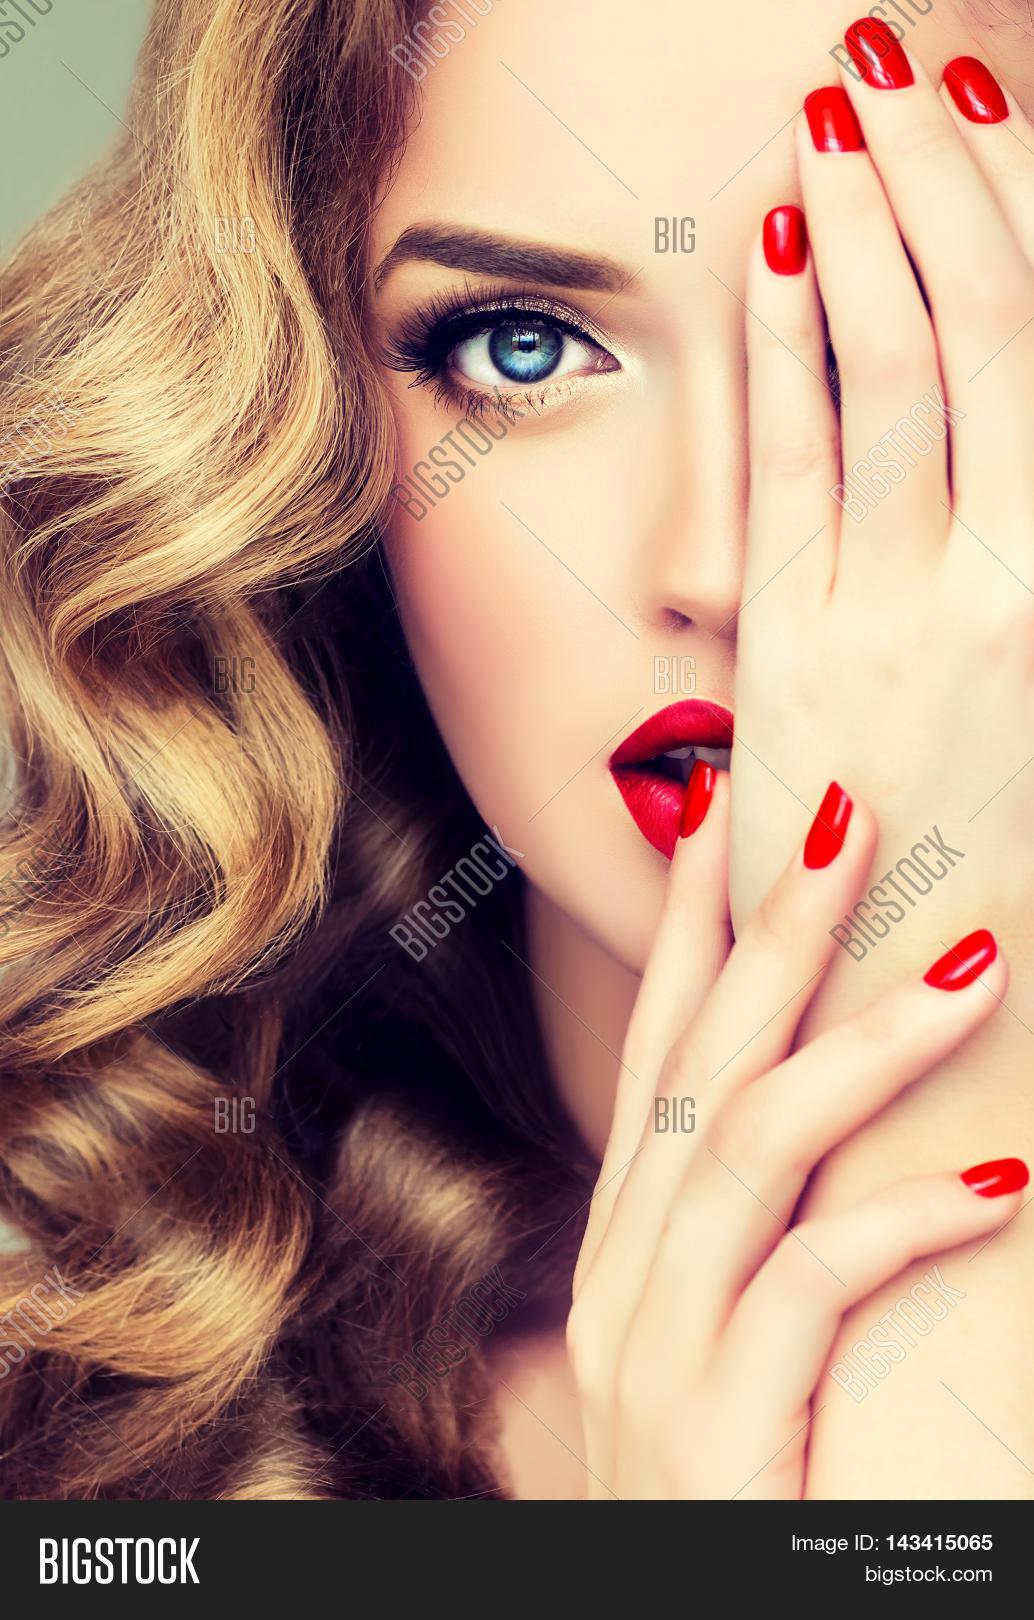 Beautiful Blonde Model Image & Photo (Free Trial) | Bigstock